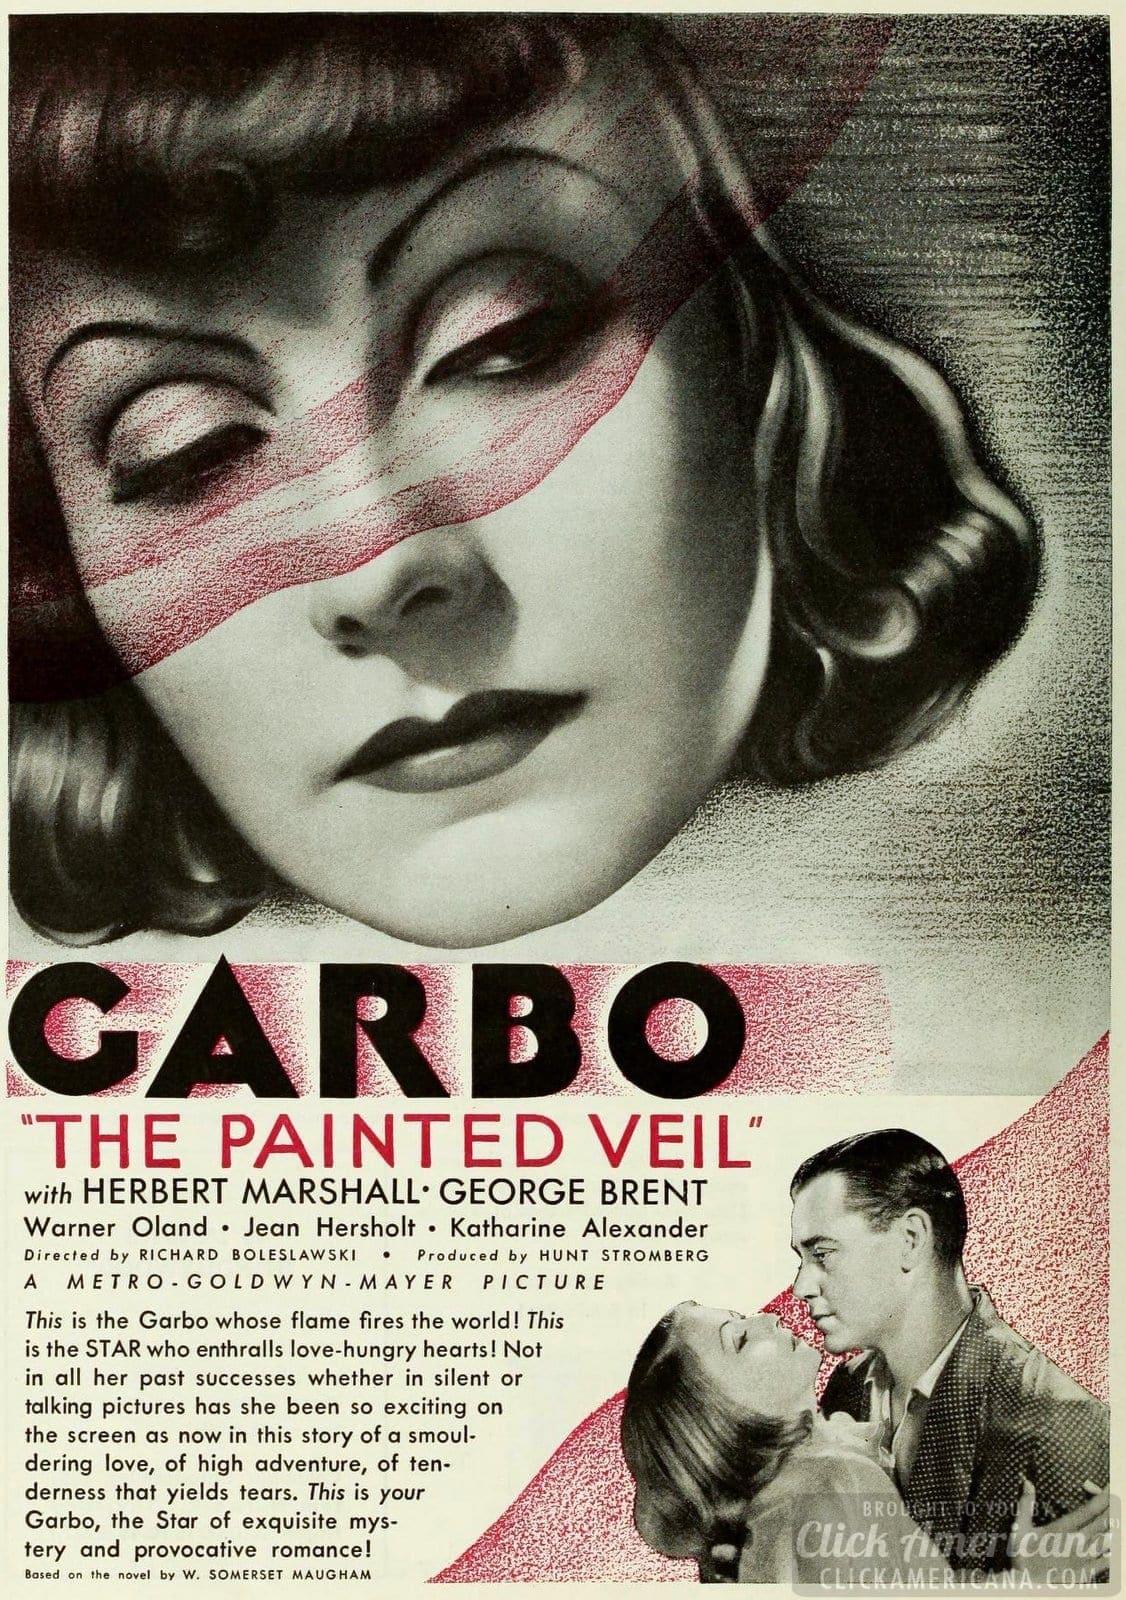 Greta Garbo in The Painted Veil with Herbert Marshall - 1934